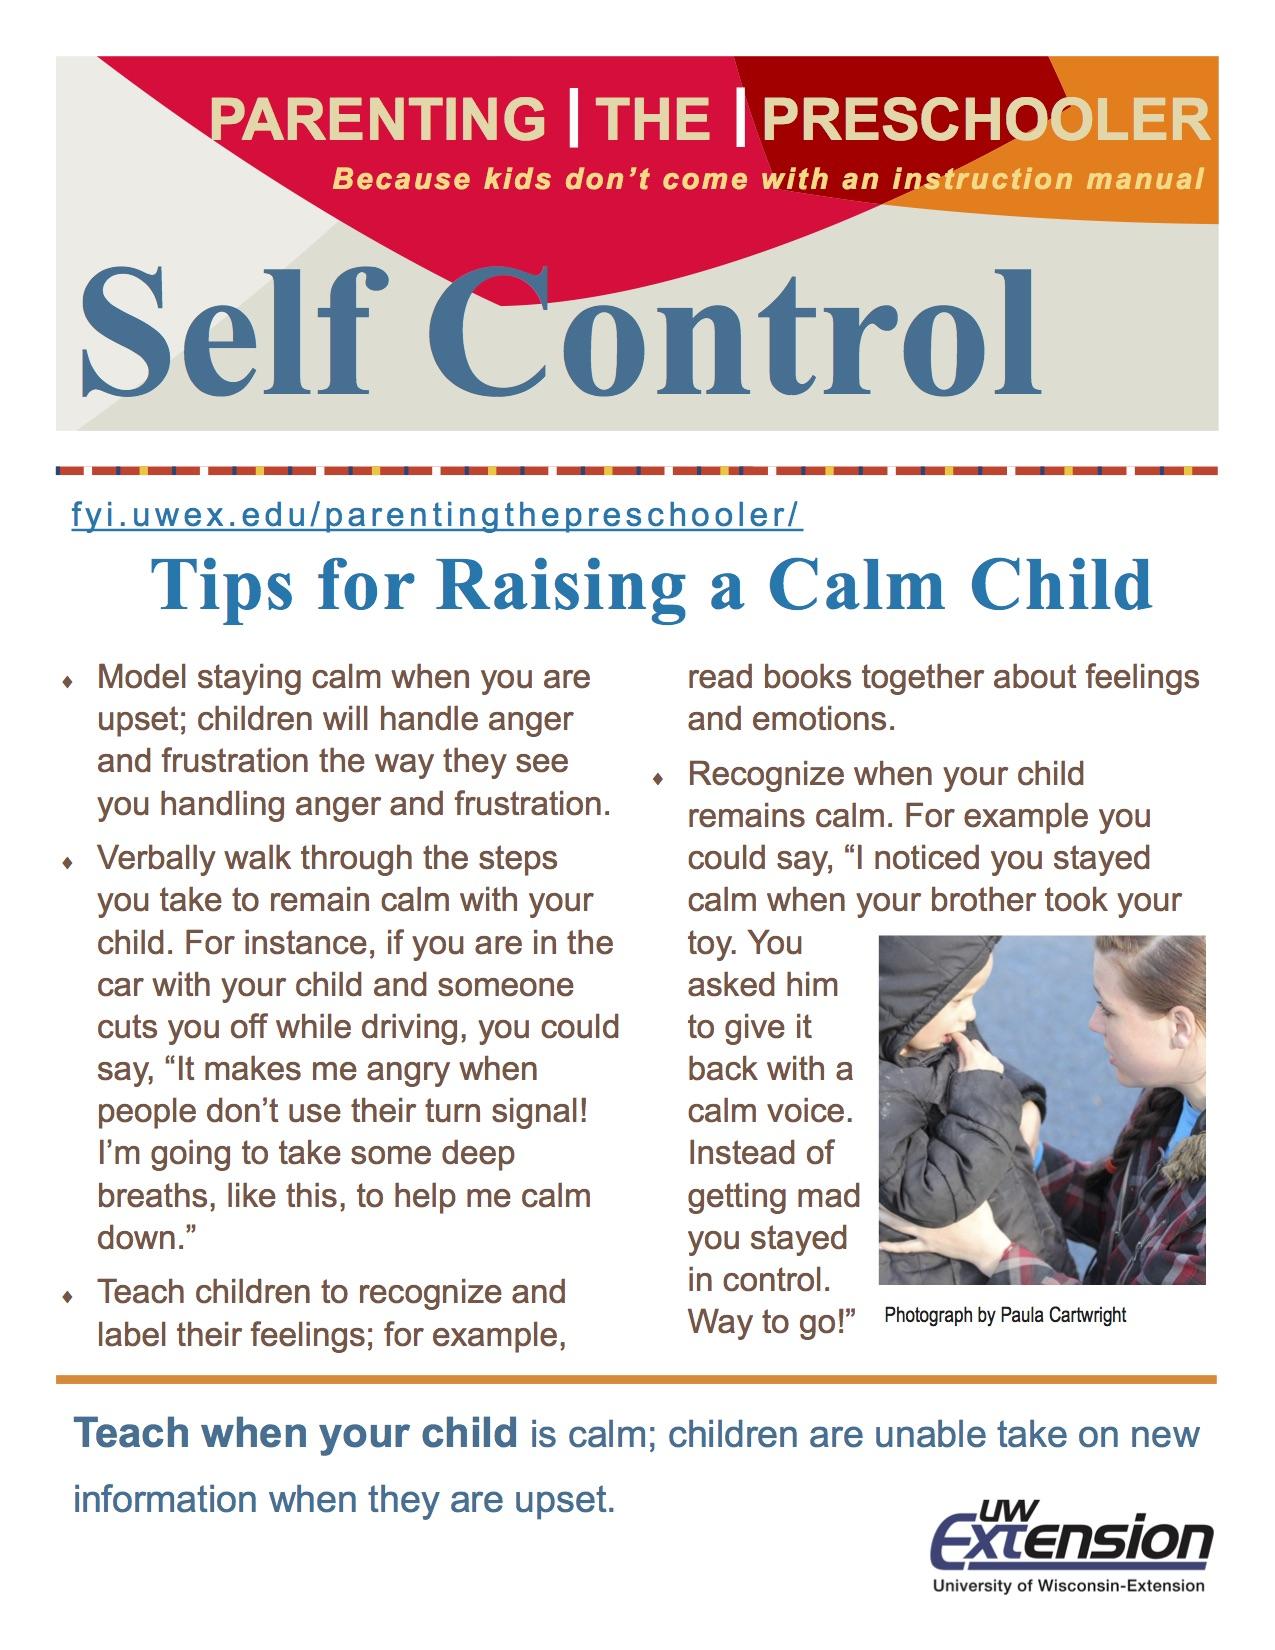 PtP-Self-Control